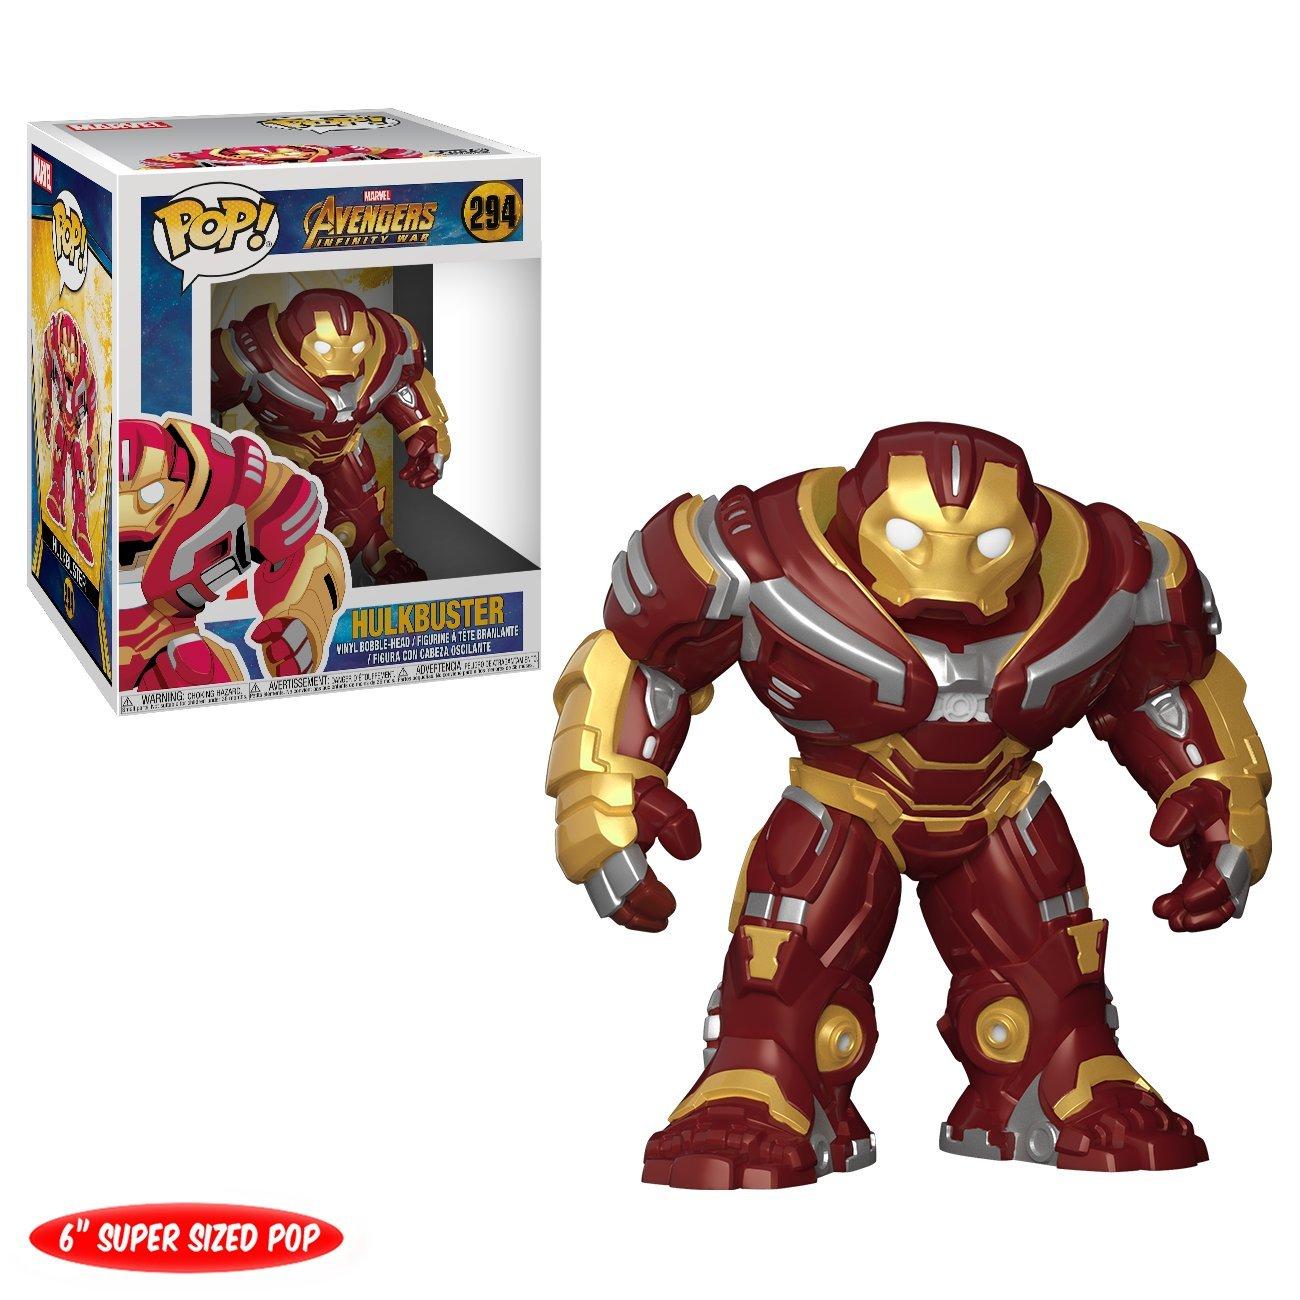 Funko Pop! Marvel: Avengers Infinity War 6'' Hulk Buster Figure, Multicolor